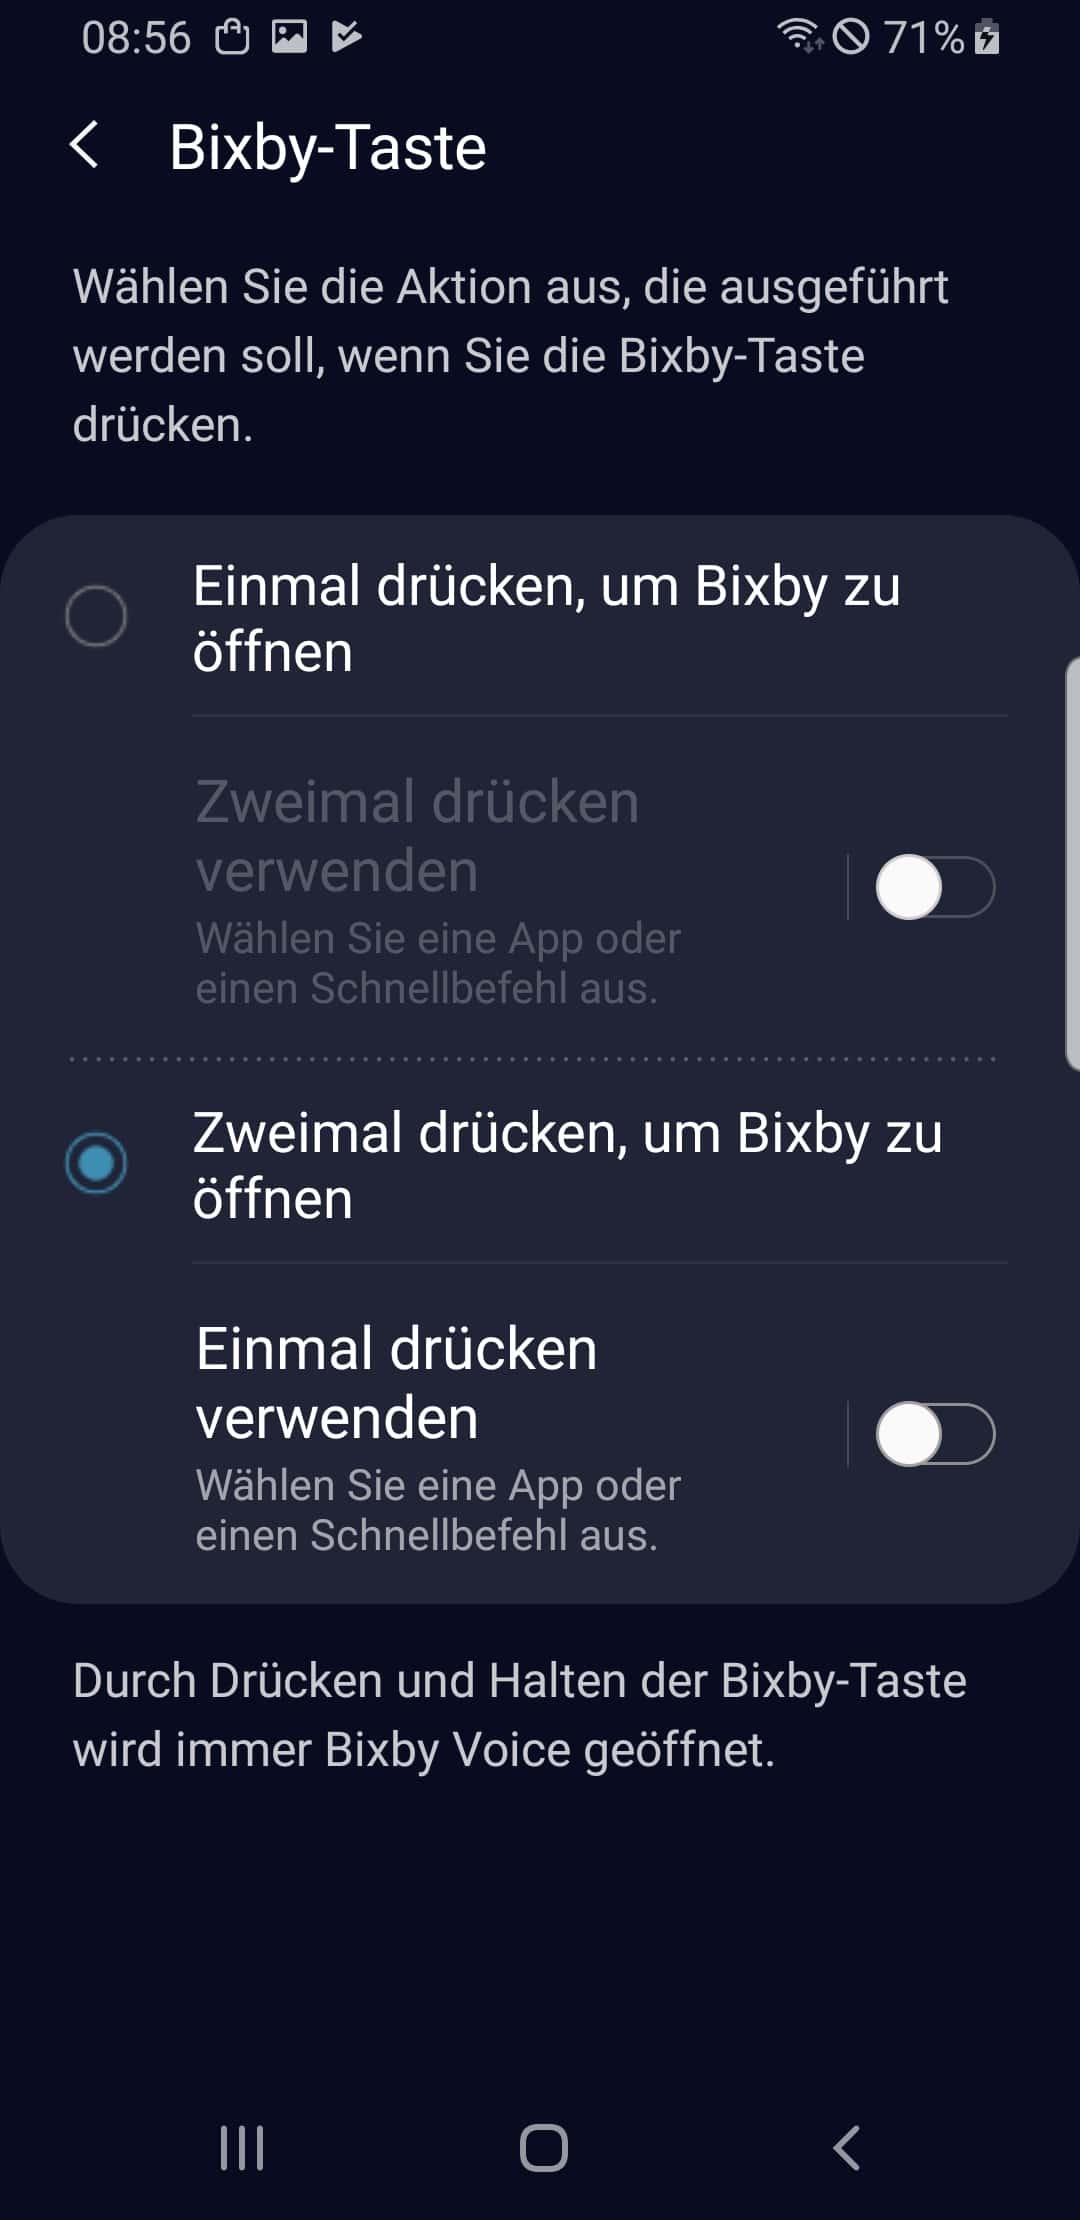 Bixby Google Assistant Anleitung 10 techboys.de • smarte News, auf den Punkt! Bixby Google Assistant Anleitung